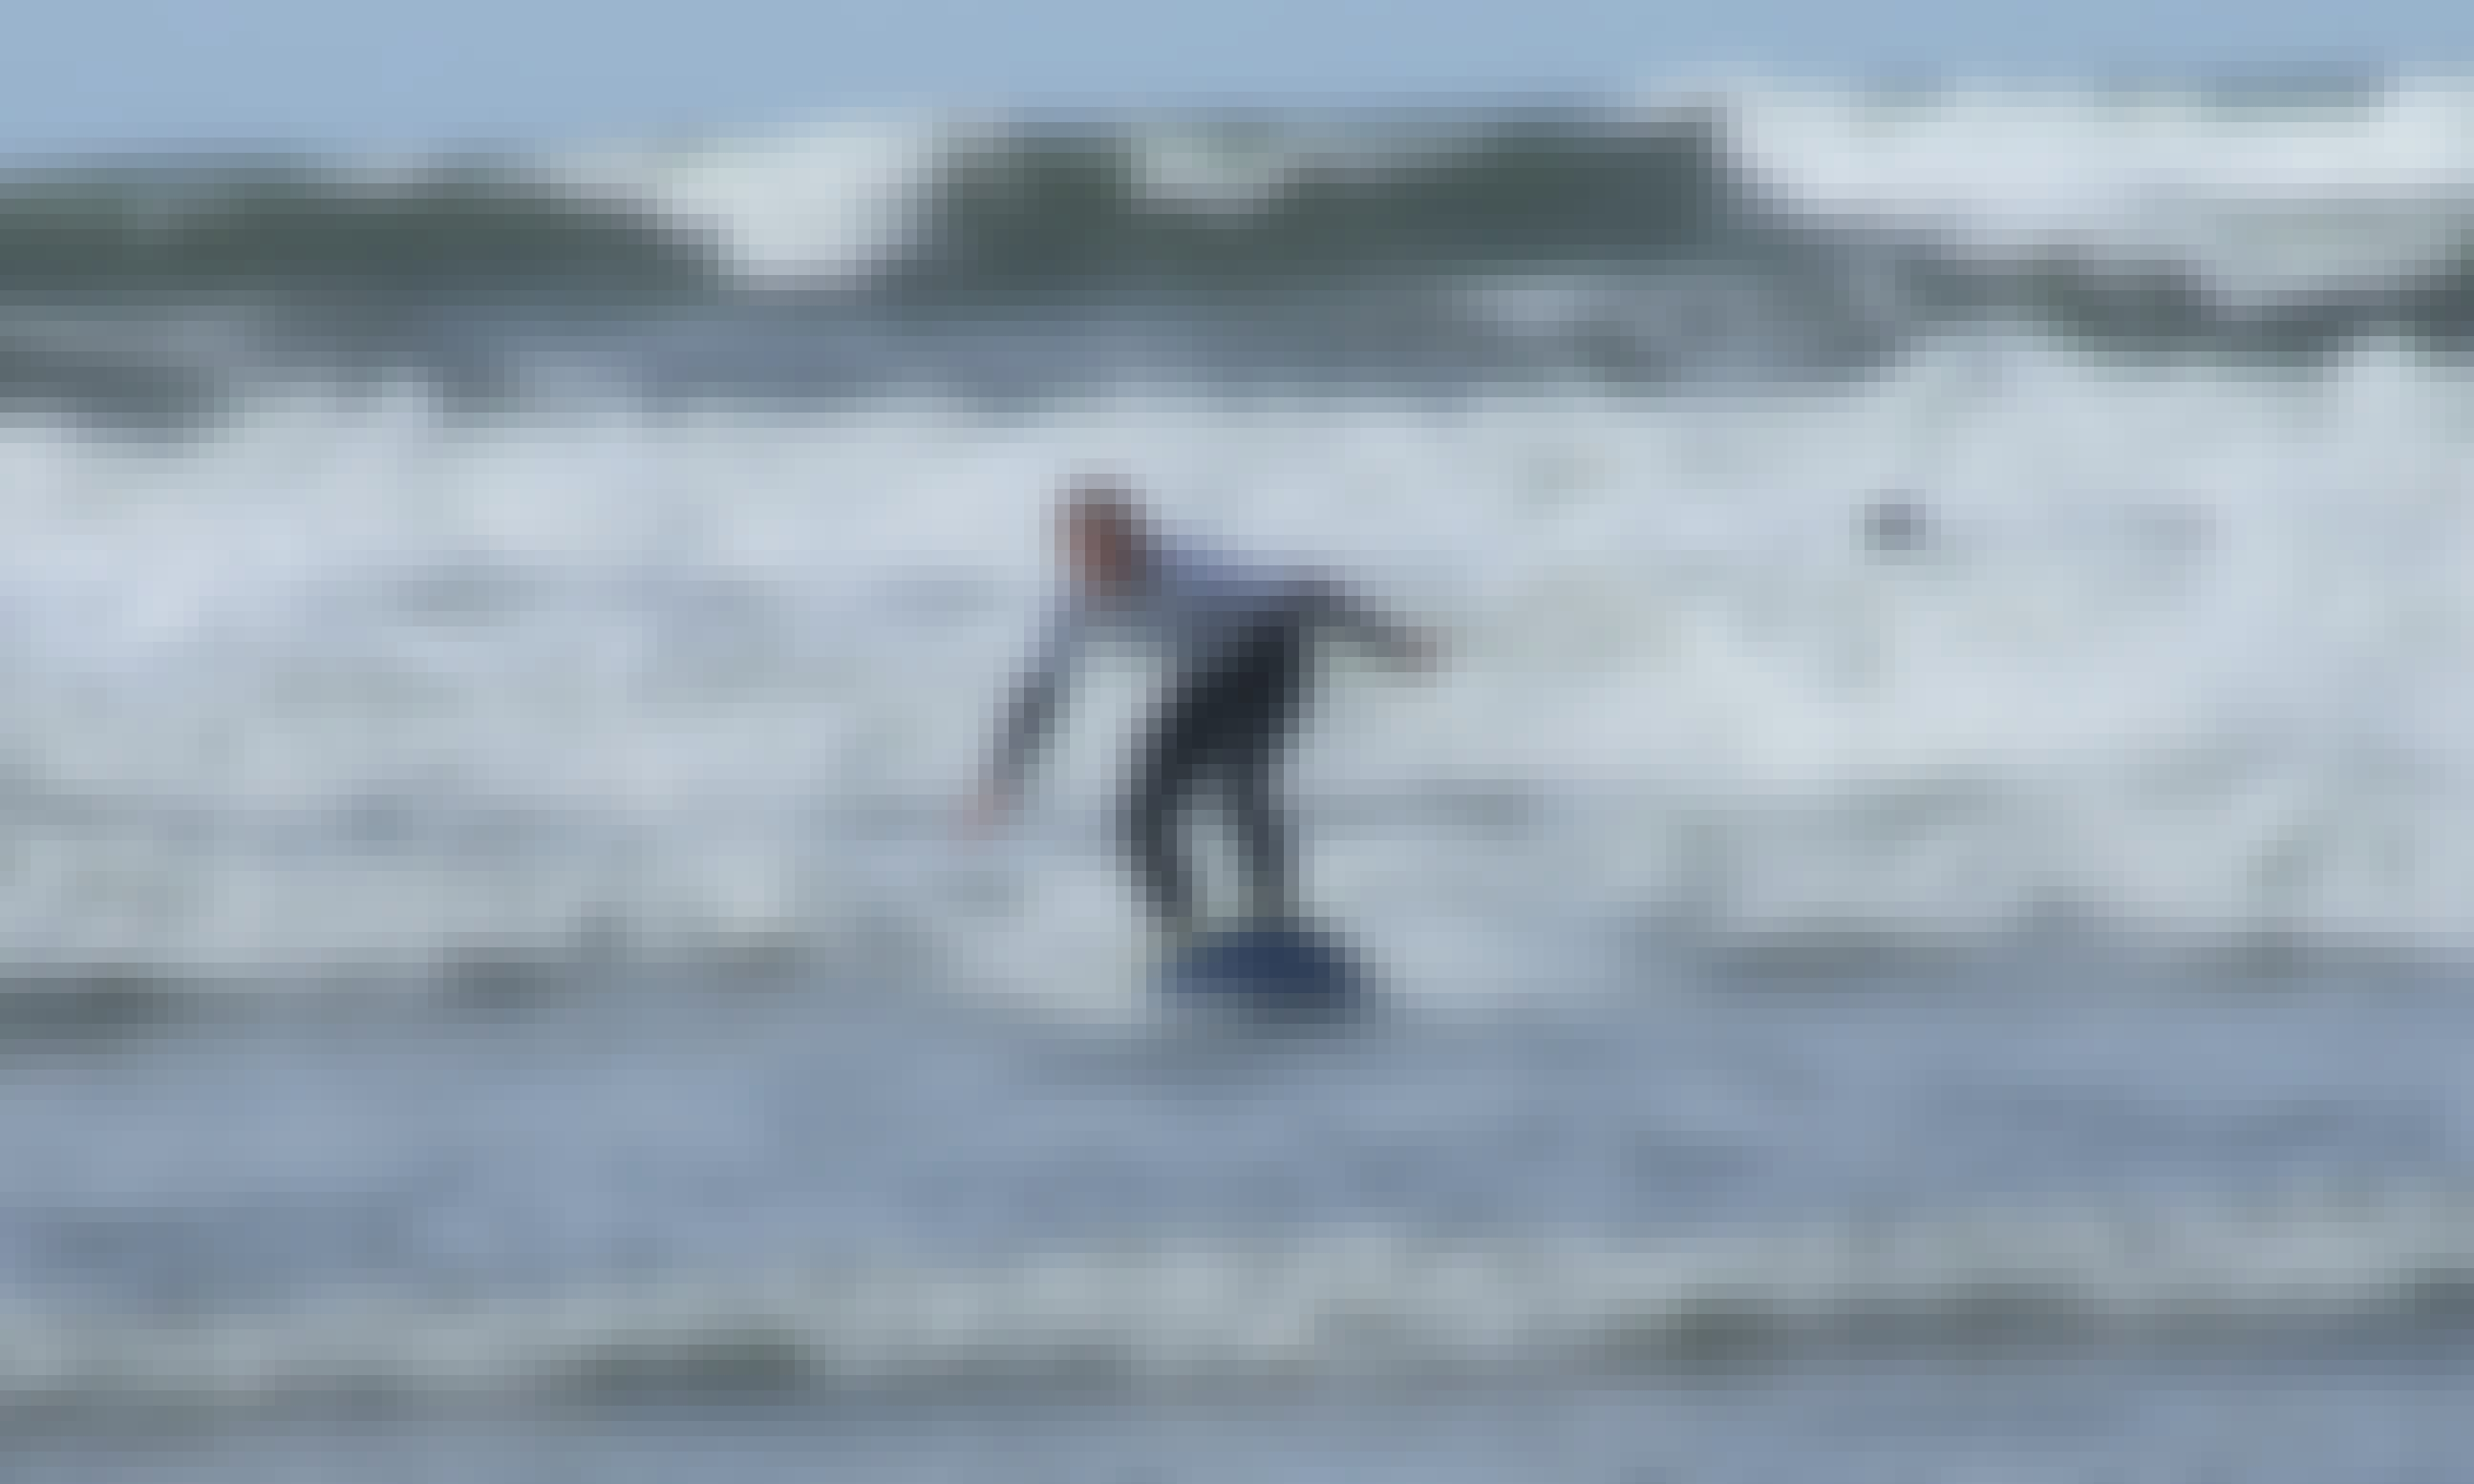 Enjoy Surf Lessons at Llangennith Beach in Swansea, Wales